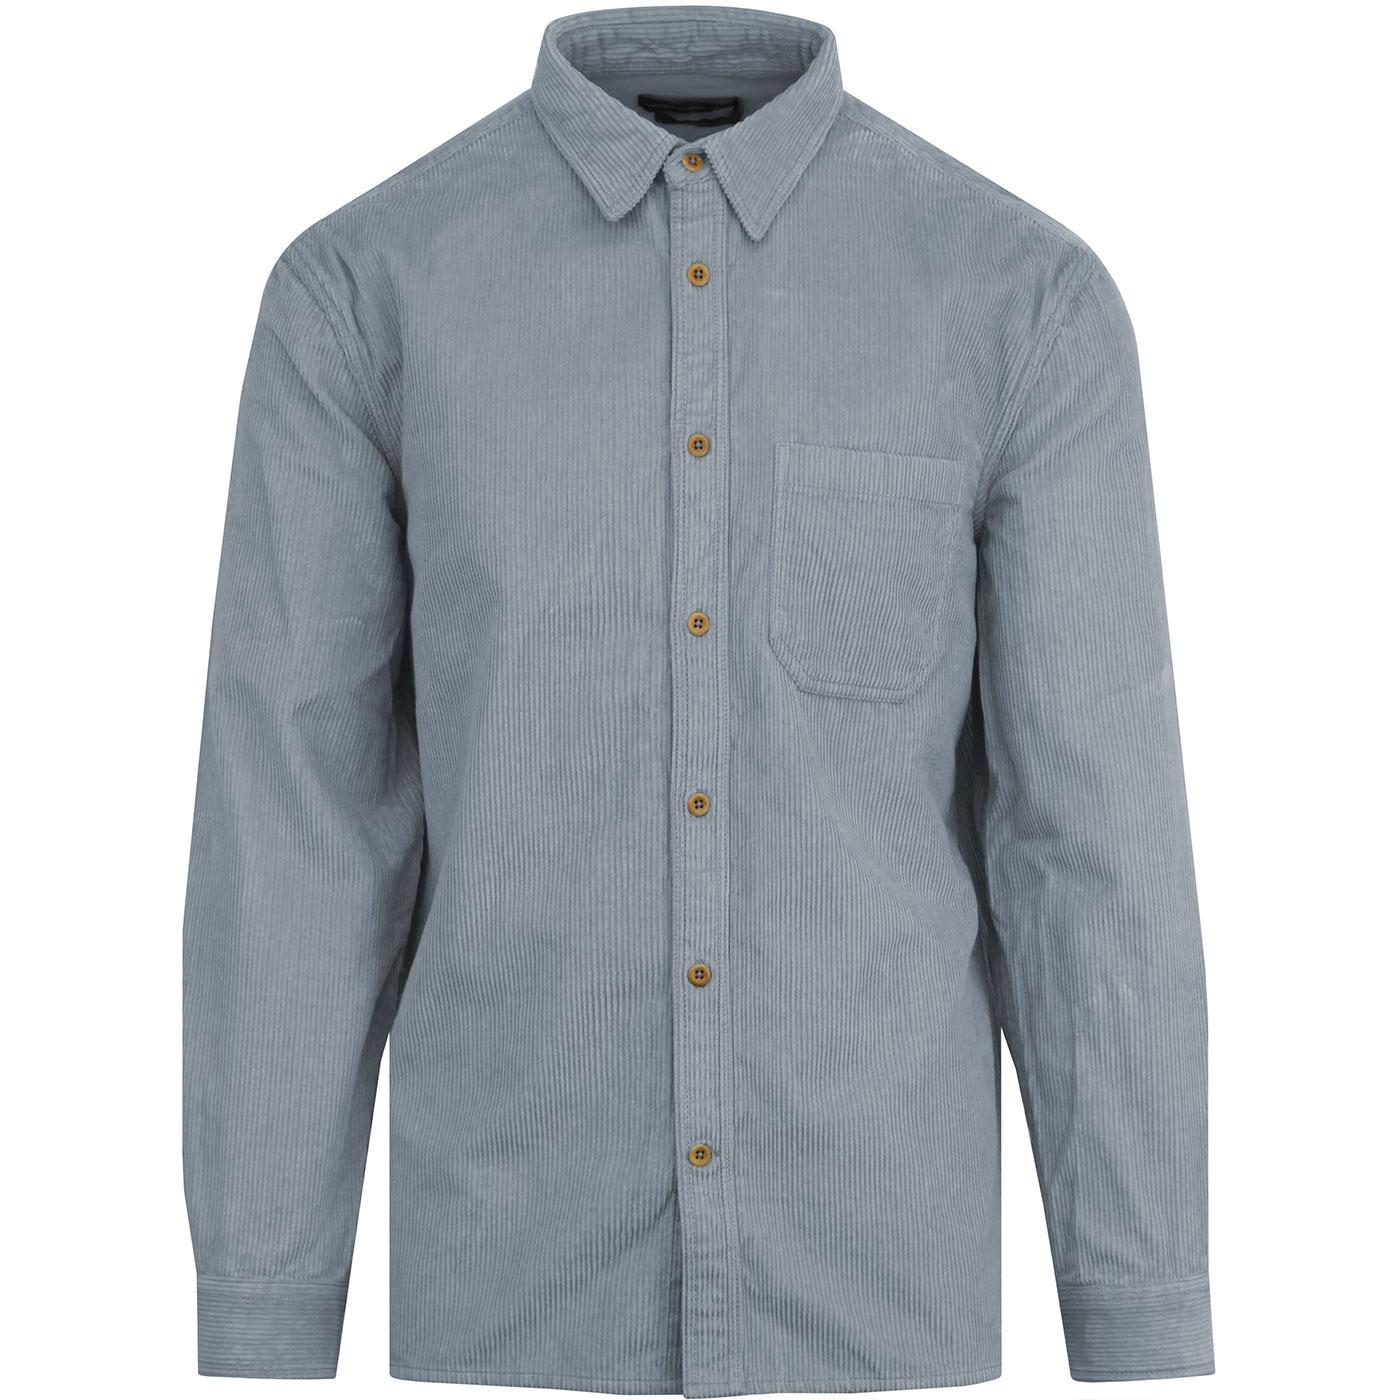 FRENCH CONNECTION Retro Mod Jumbo Cord Shirt (PB)